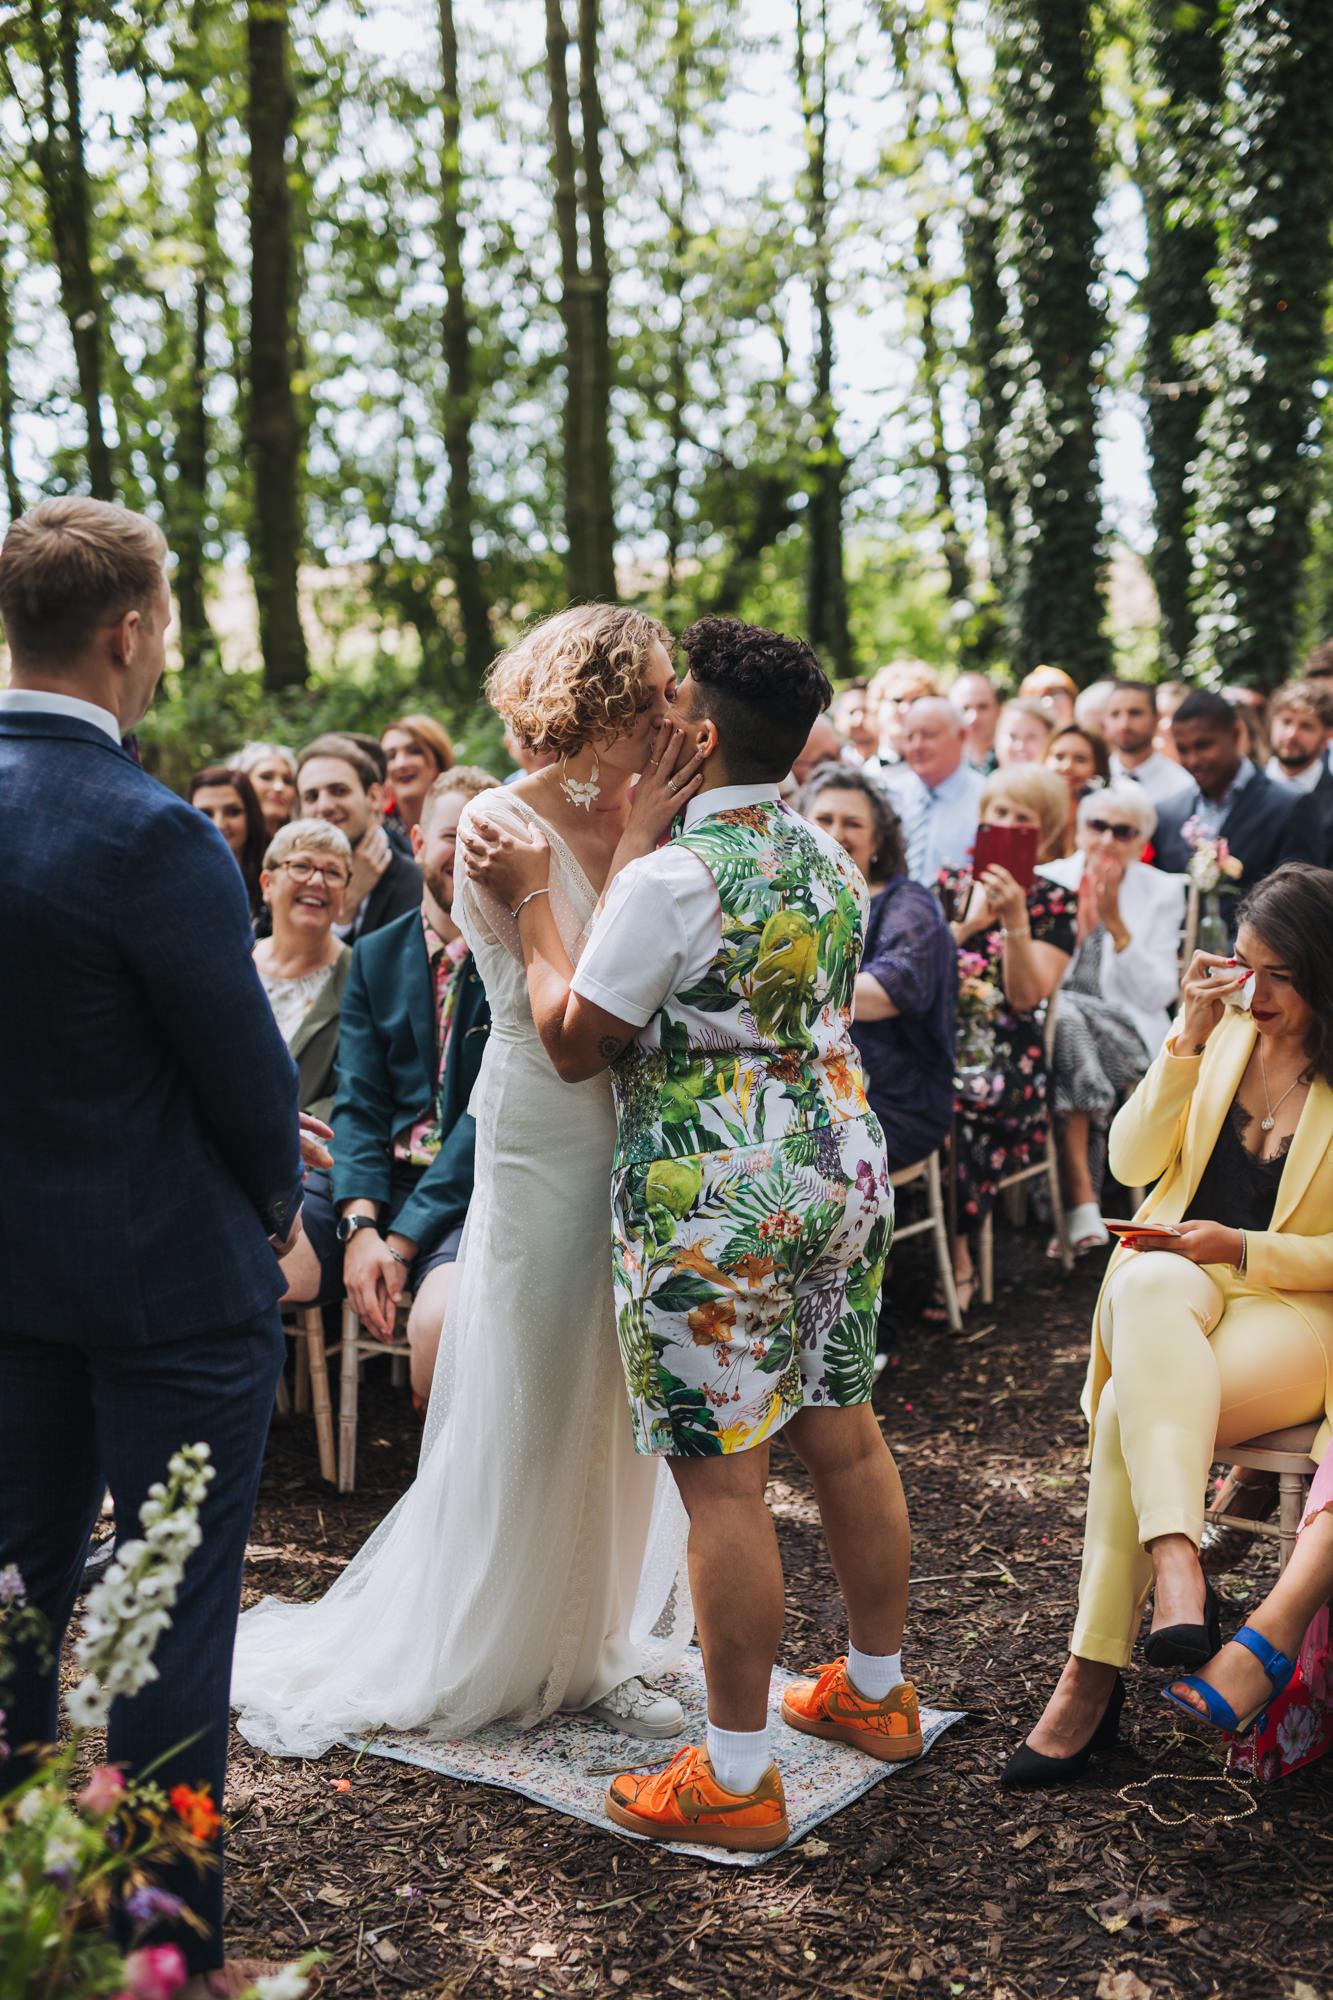 applewood wedding photographer leeds, yorkshire37.jpg